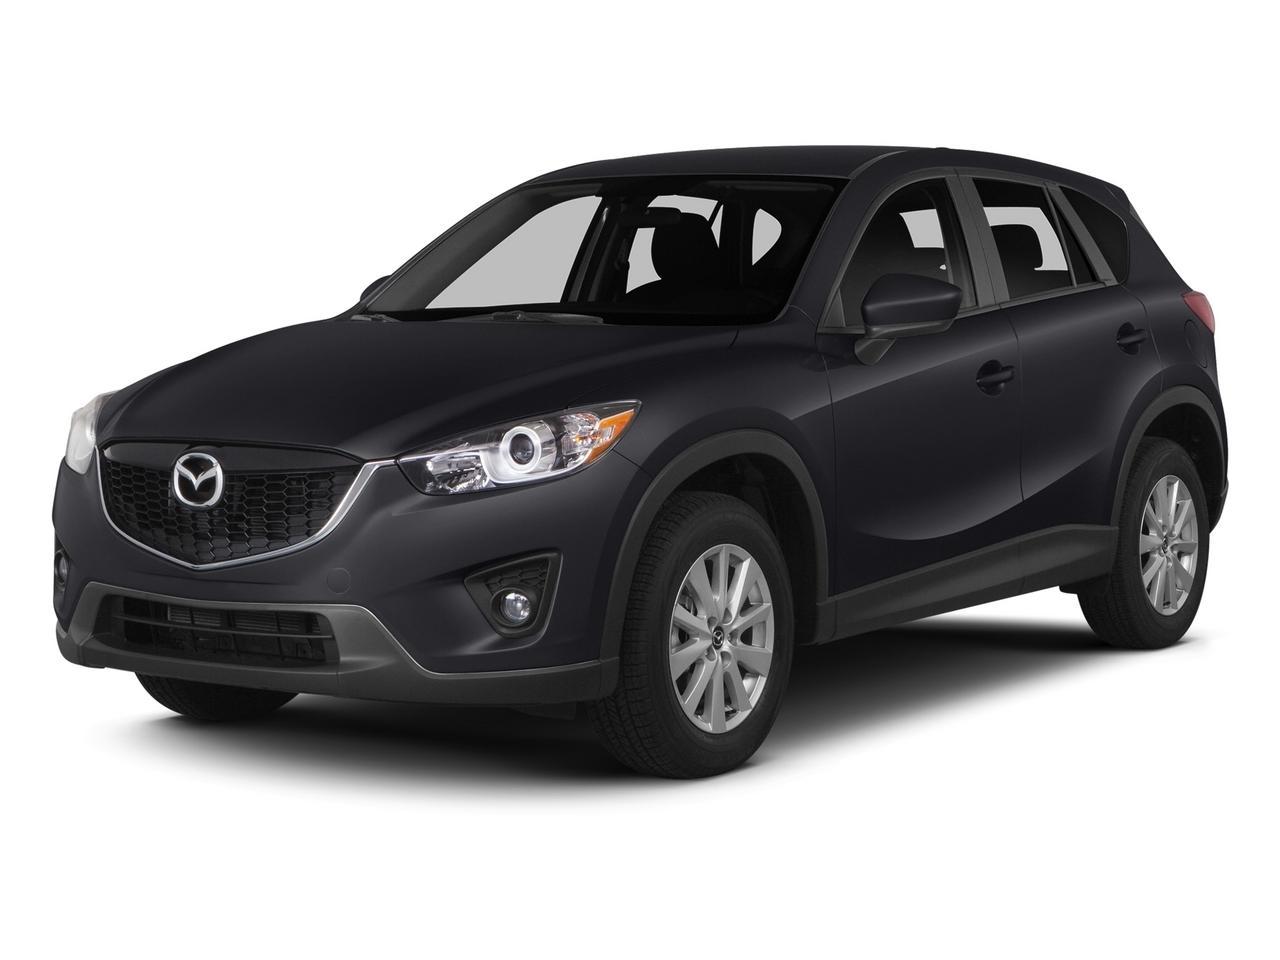 2015 Mazda CX-5 Vehicle Photo in Portland, OR 97225